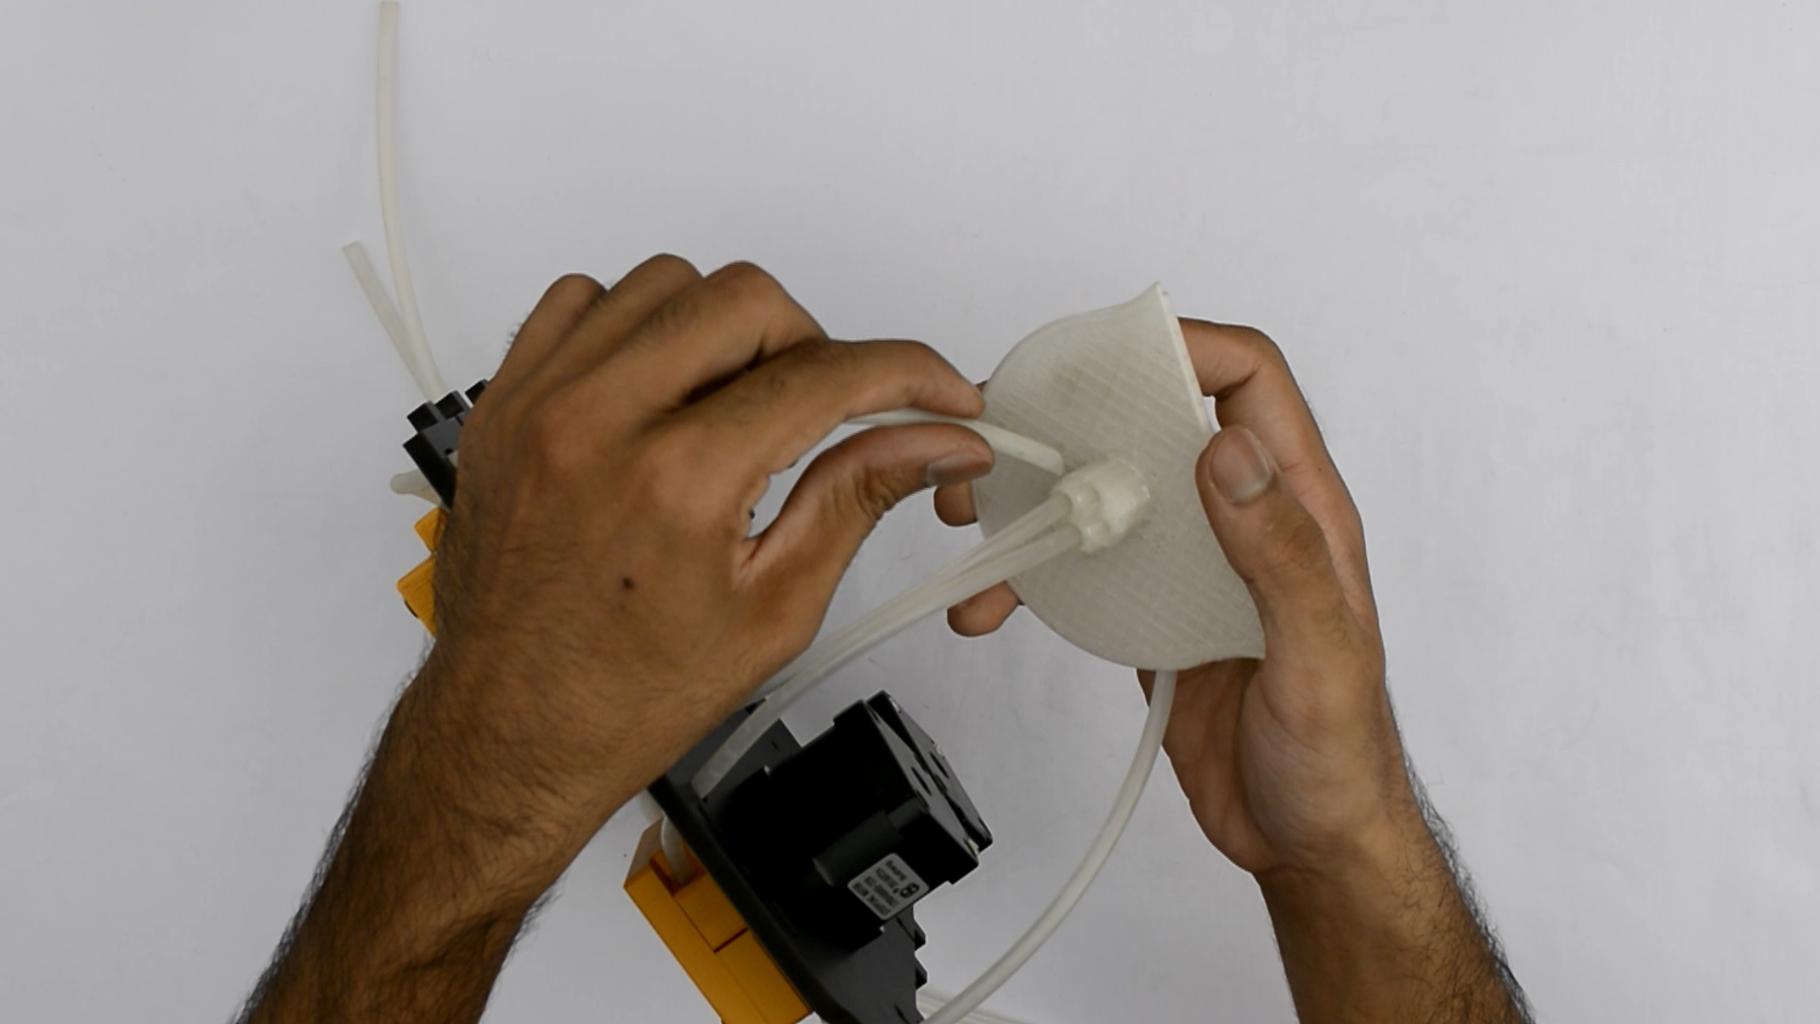 Insert the Tubes in the 3D Printed Tube Holder